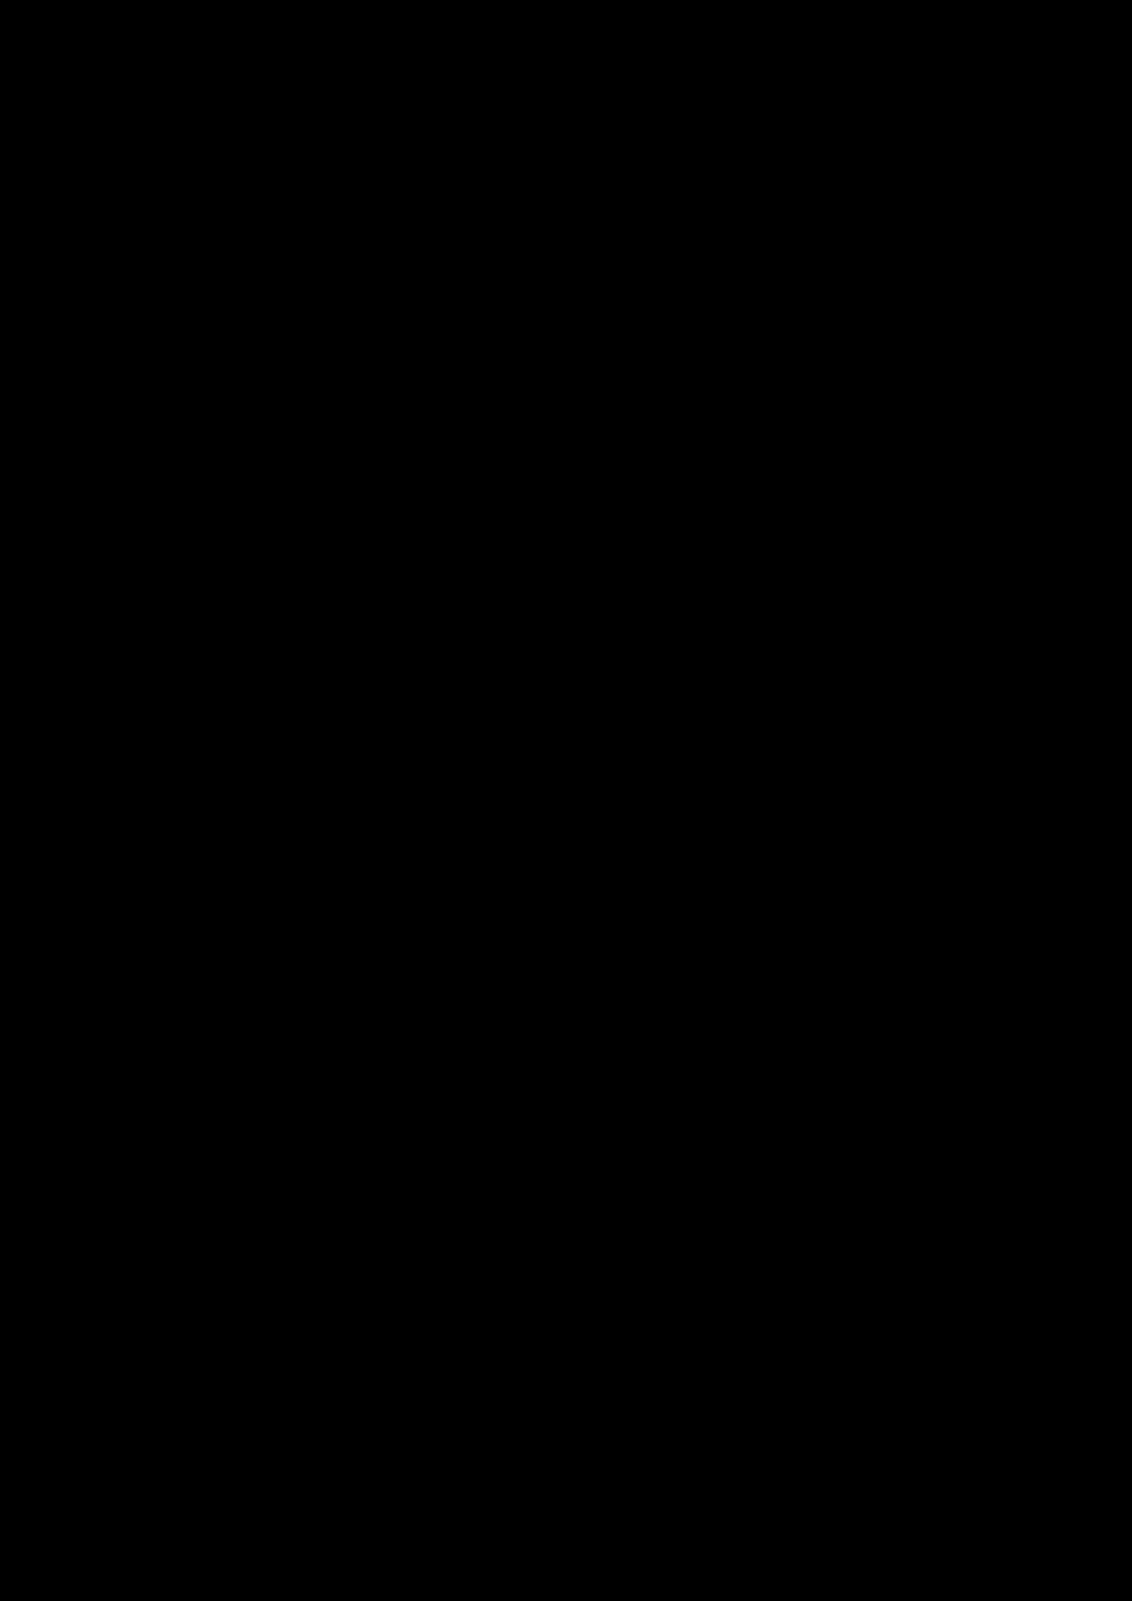 Prosti slide, Image 39